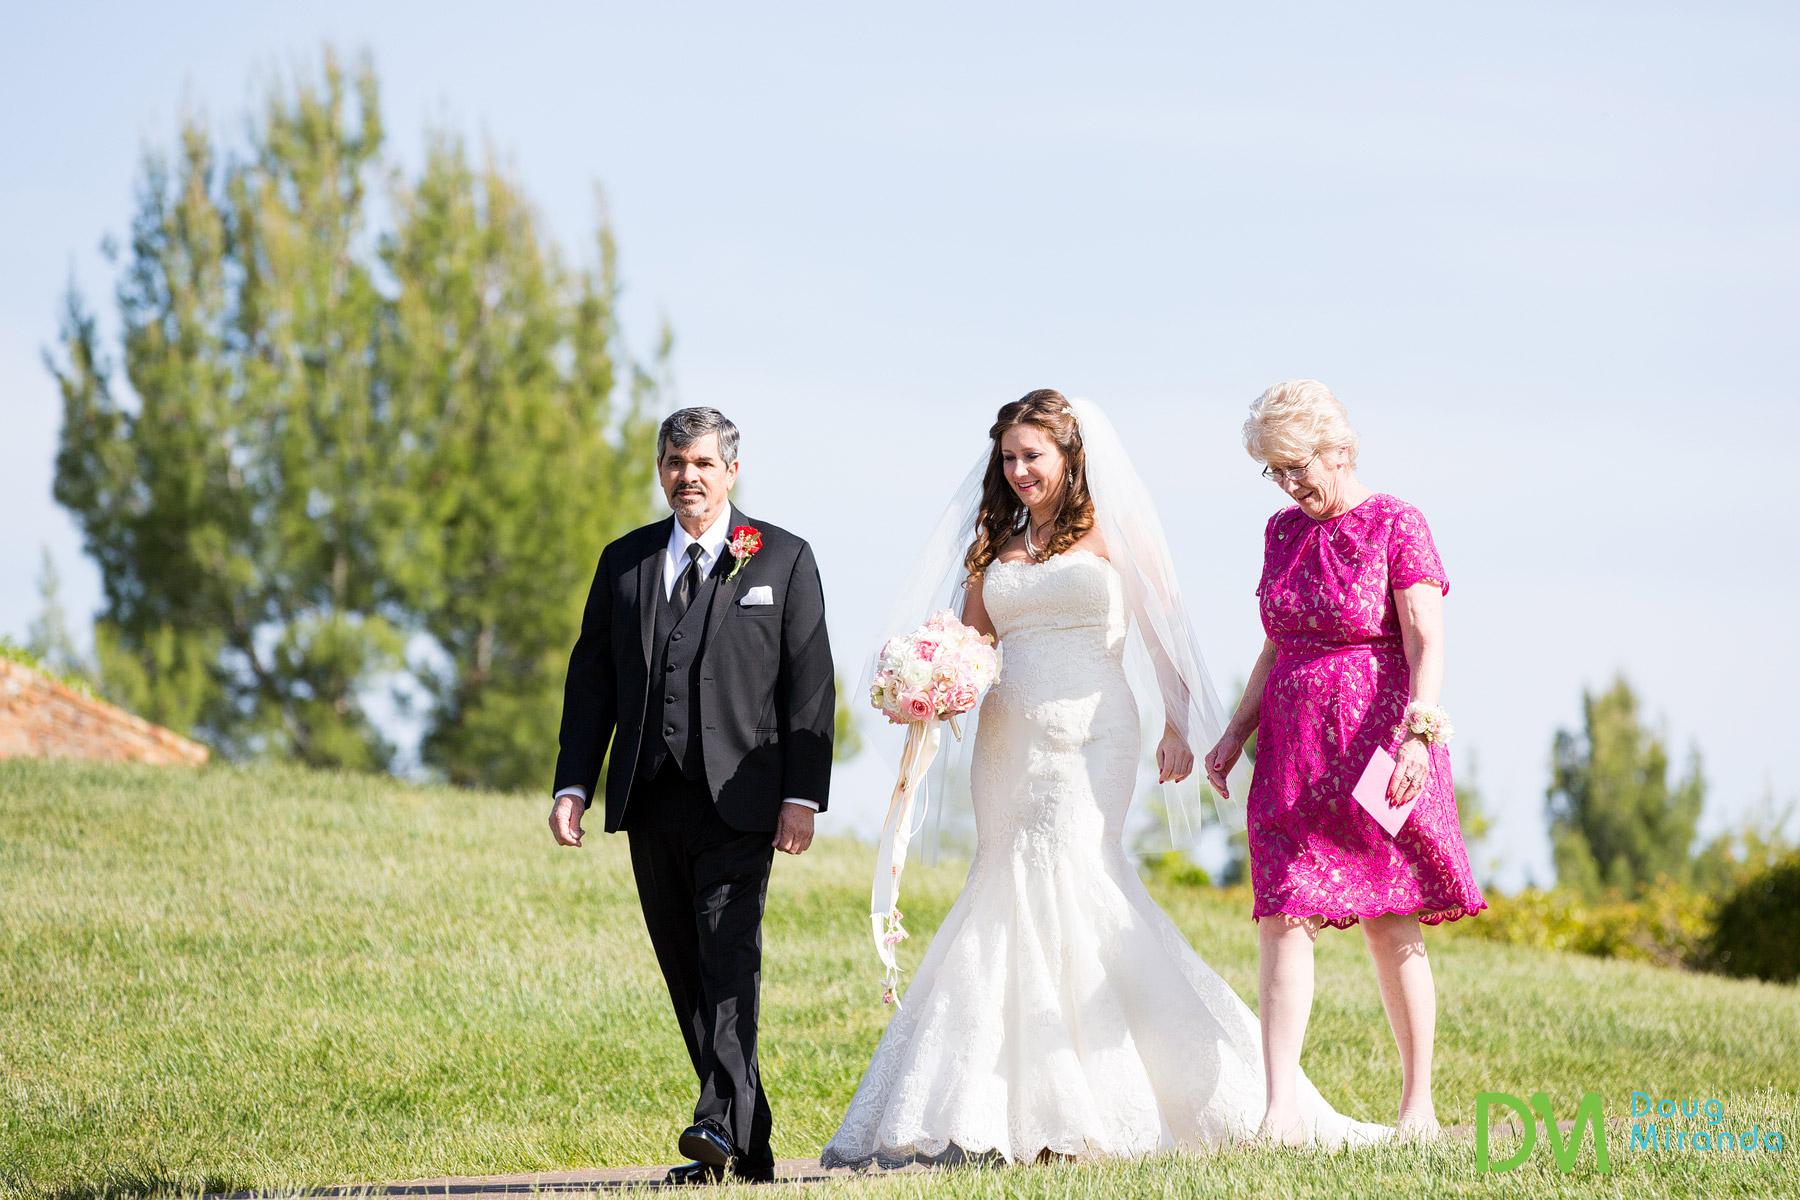 wedding photography at serrano country club